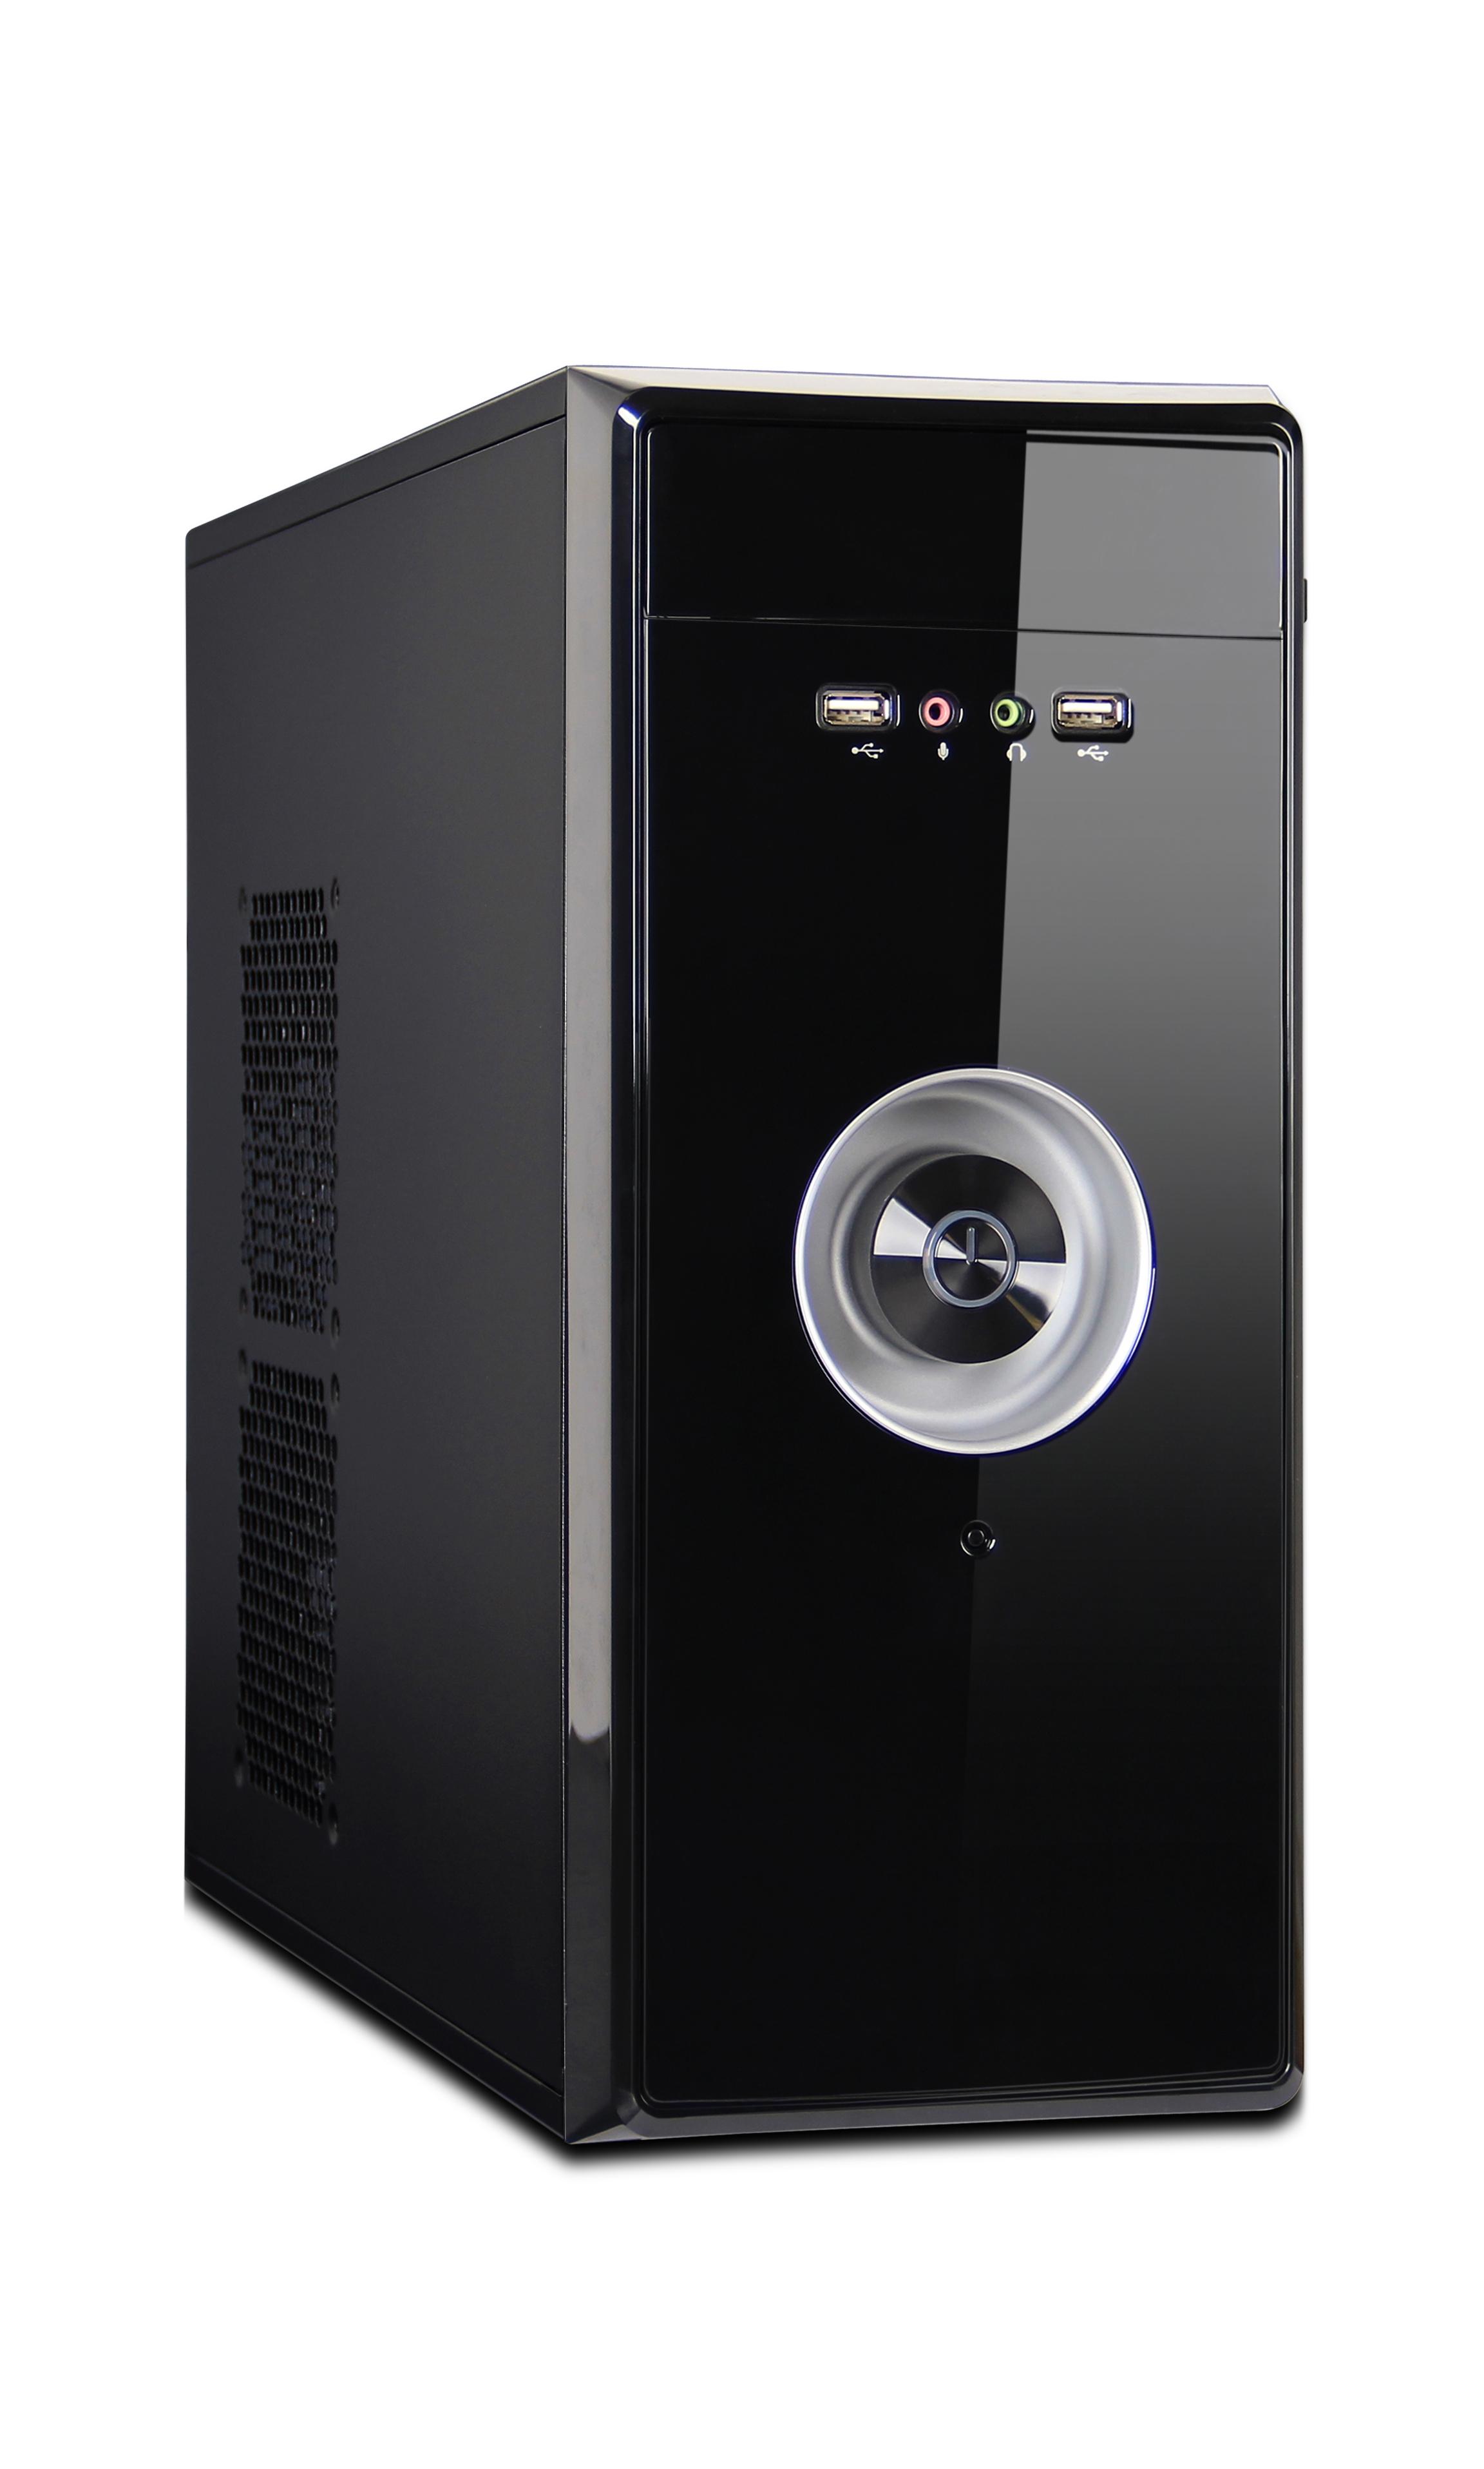 ПЭВМ Nautilus A02 Системный блок Black / AMD A6-7480 (Carrizo, FM2+, 3,5 ГГц, Radeon R5, L2 1024Kb) / 8GB / 500GB / noDVD / Win 8.1 Pro 64 процессор amd a6 7480 oem radeon r5 series 65w 2c 2t 3 8gh max 1mb fm2 ad7480aci23ab